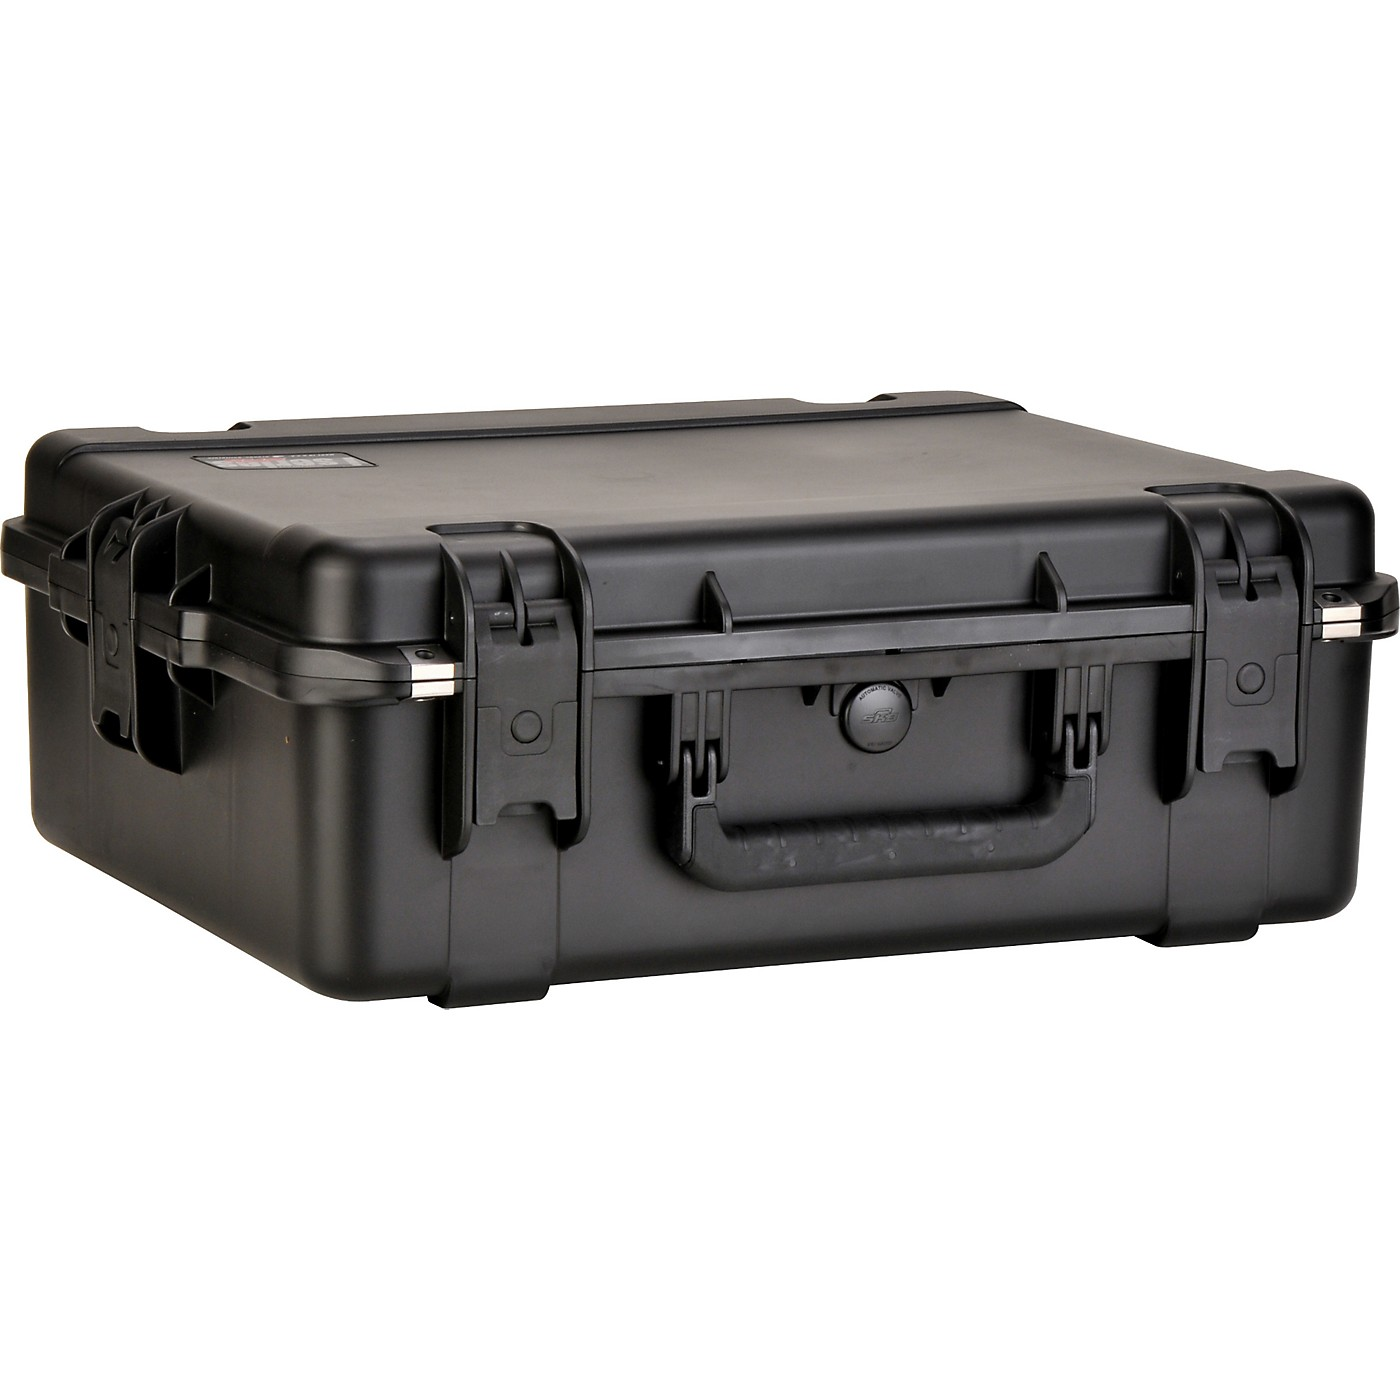 SKB Watertight PreSonus Studiolive 16.0.2 Mixer Case thumbnail